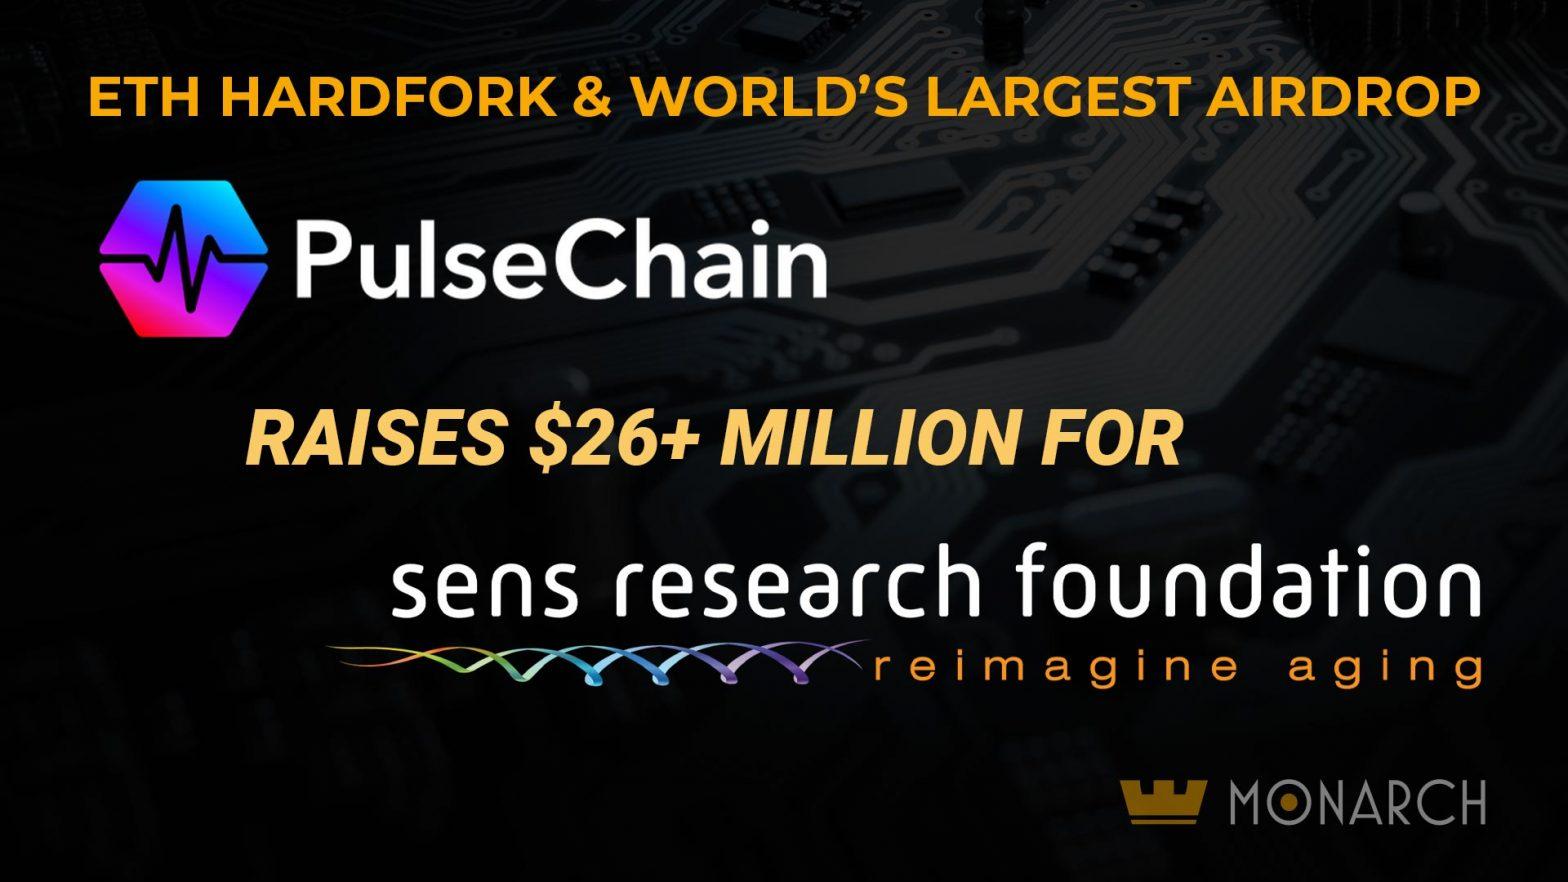 Monarch ETH HardFork PulseChain Sens Foundation Airdrop 26 Million Dollars to Charity